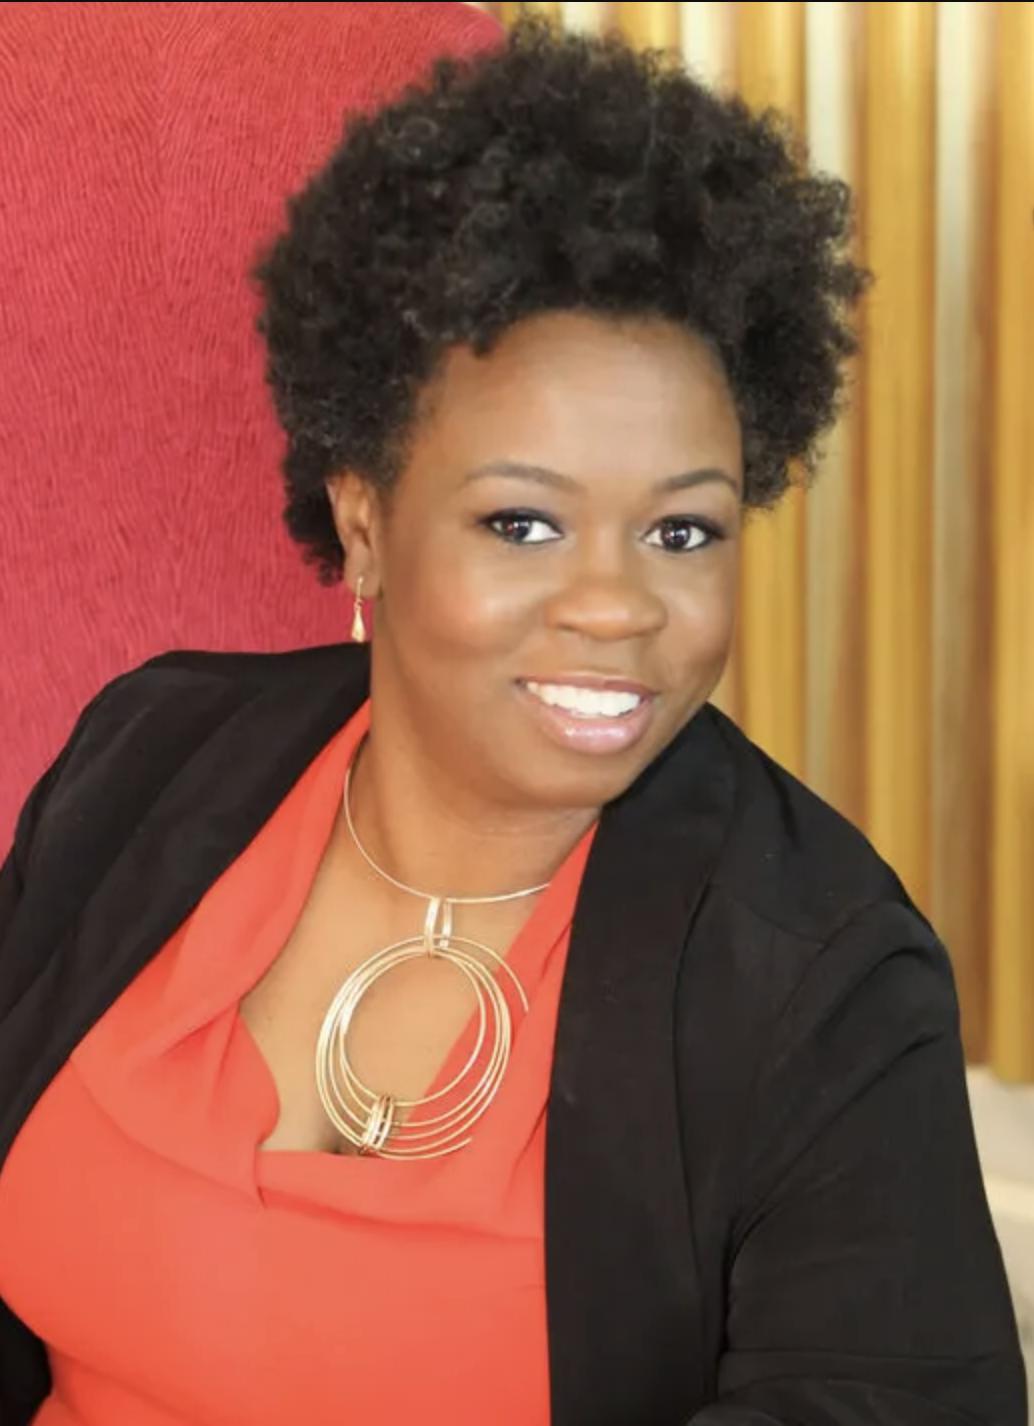 Headshot of Michele Heyward, a Black woman